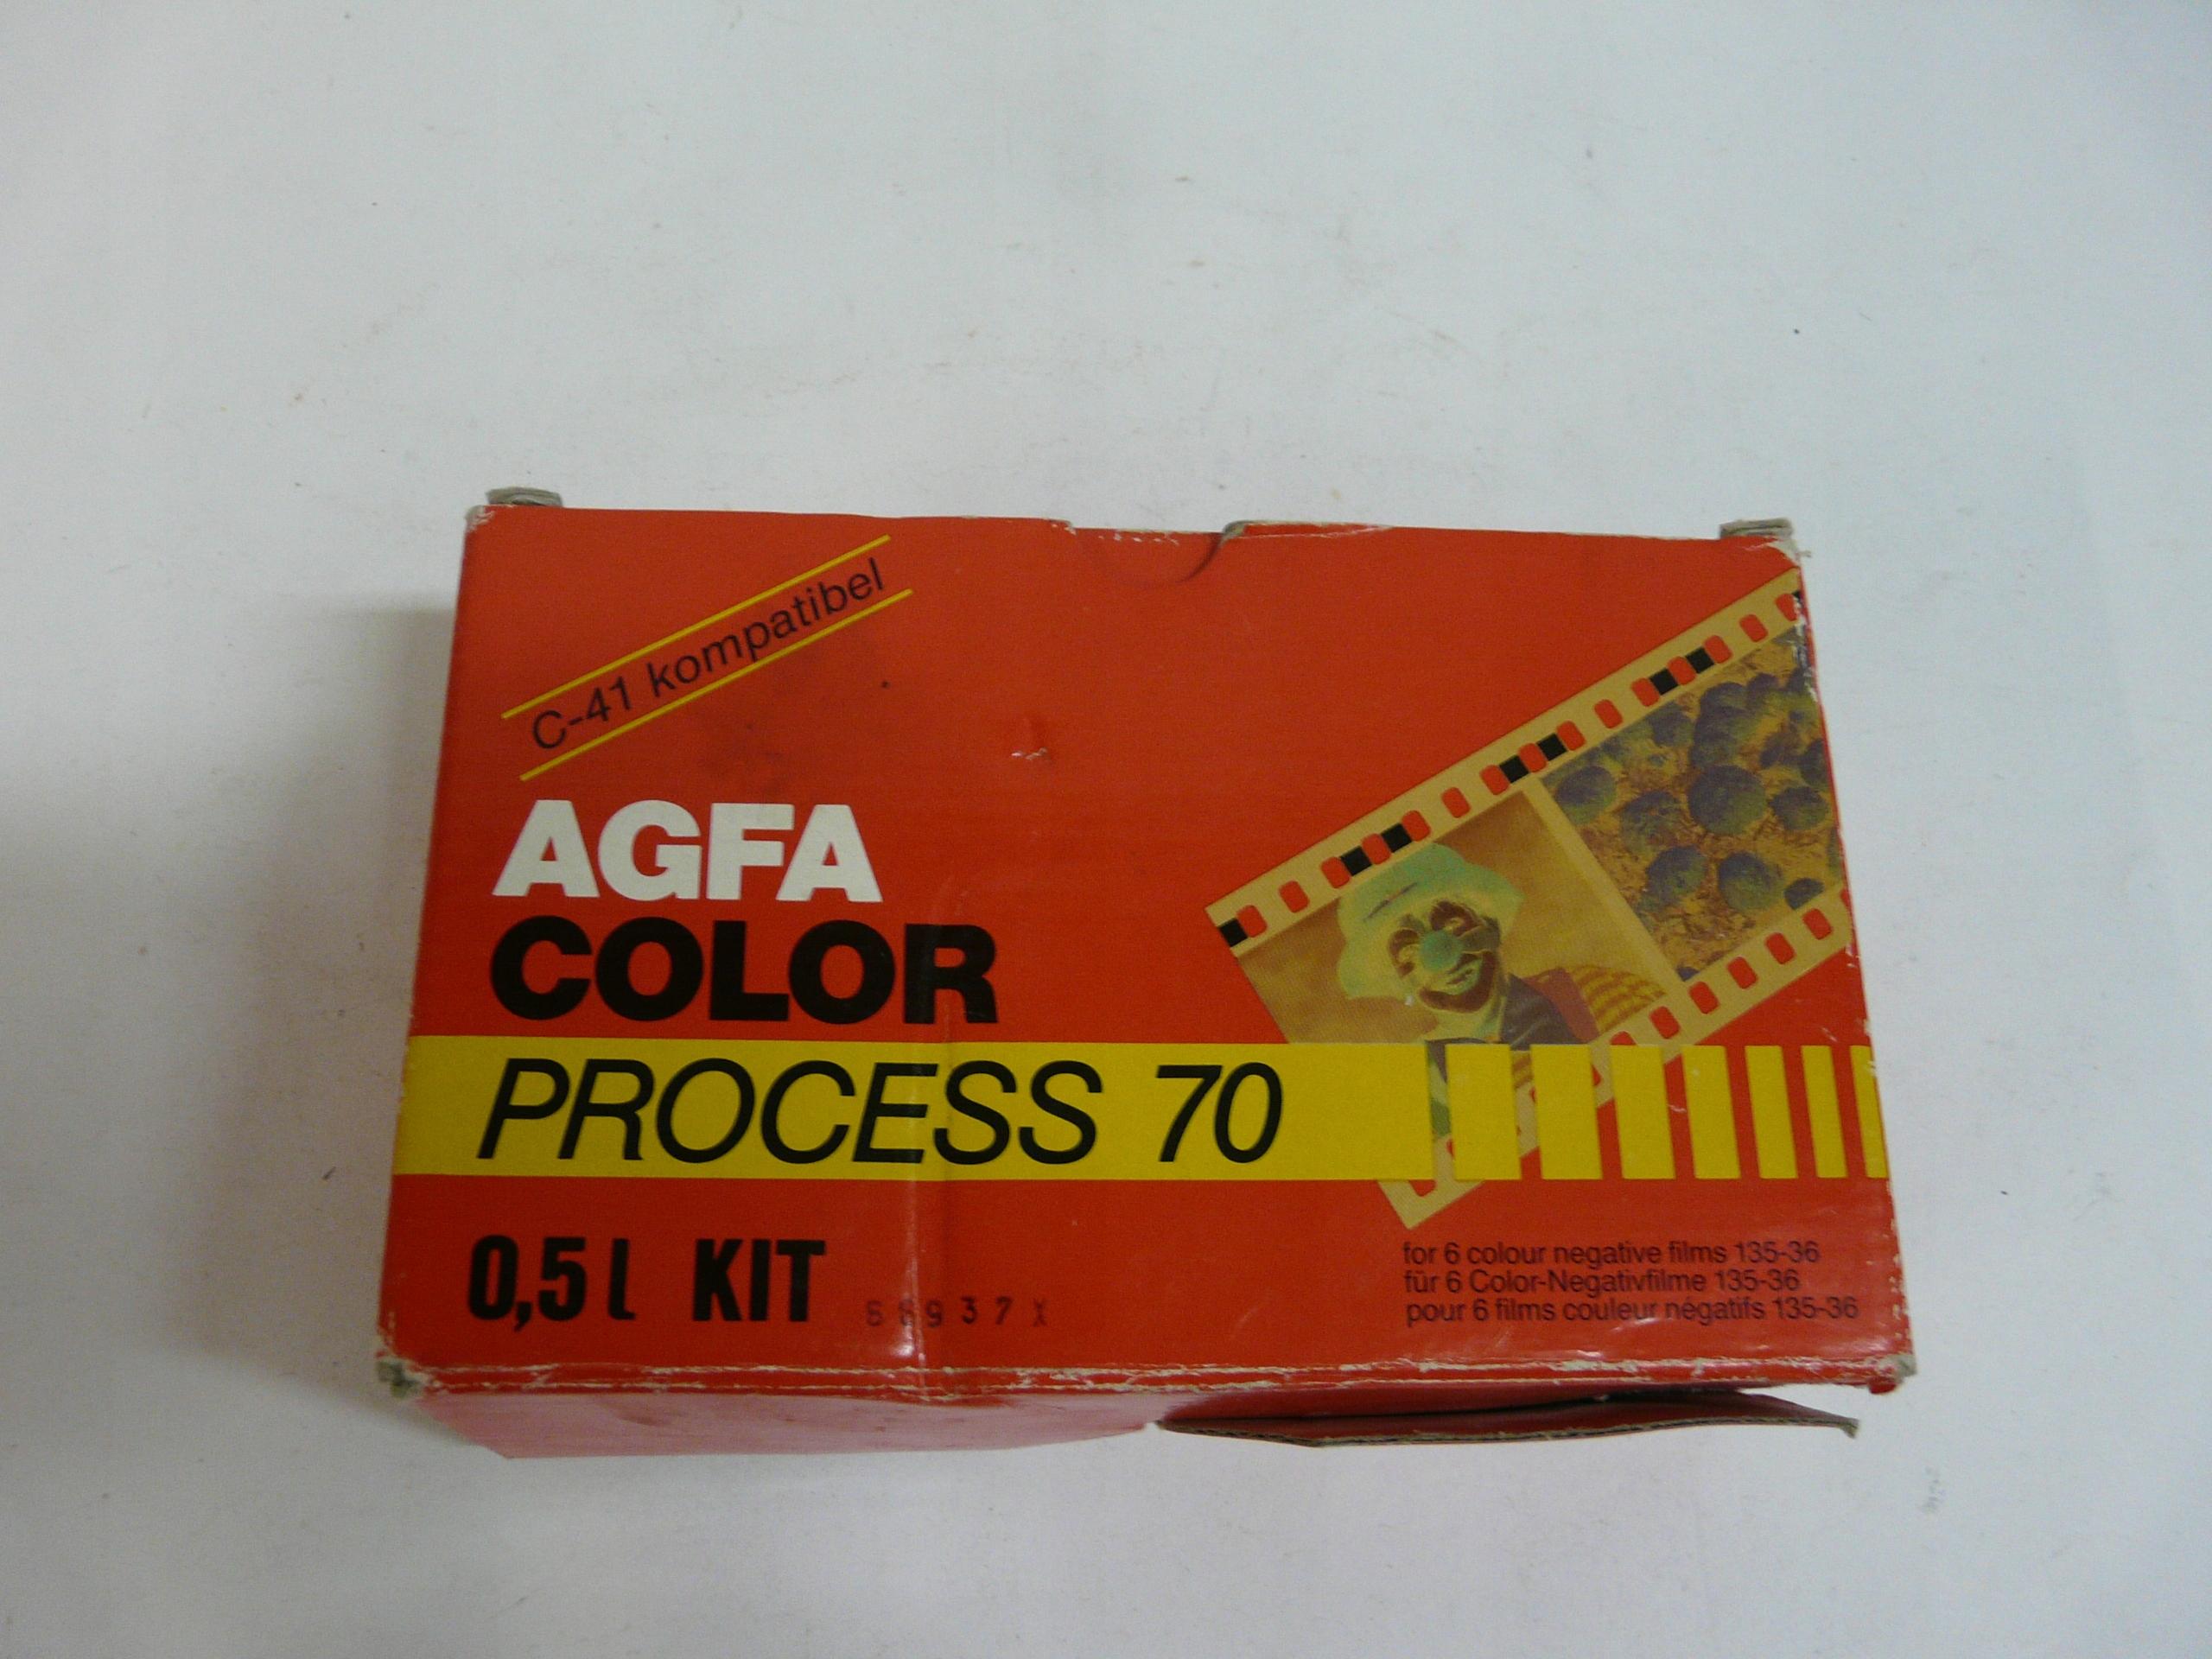 AGFA COLOR PROCESS 70 chemia do kolorów